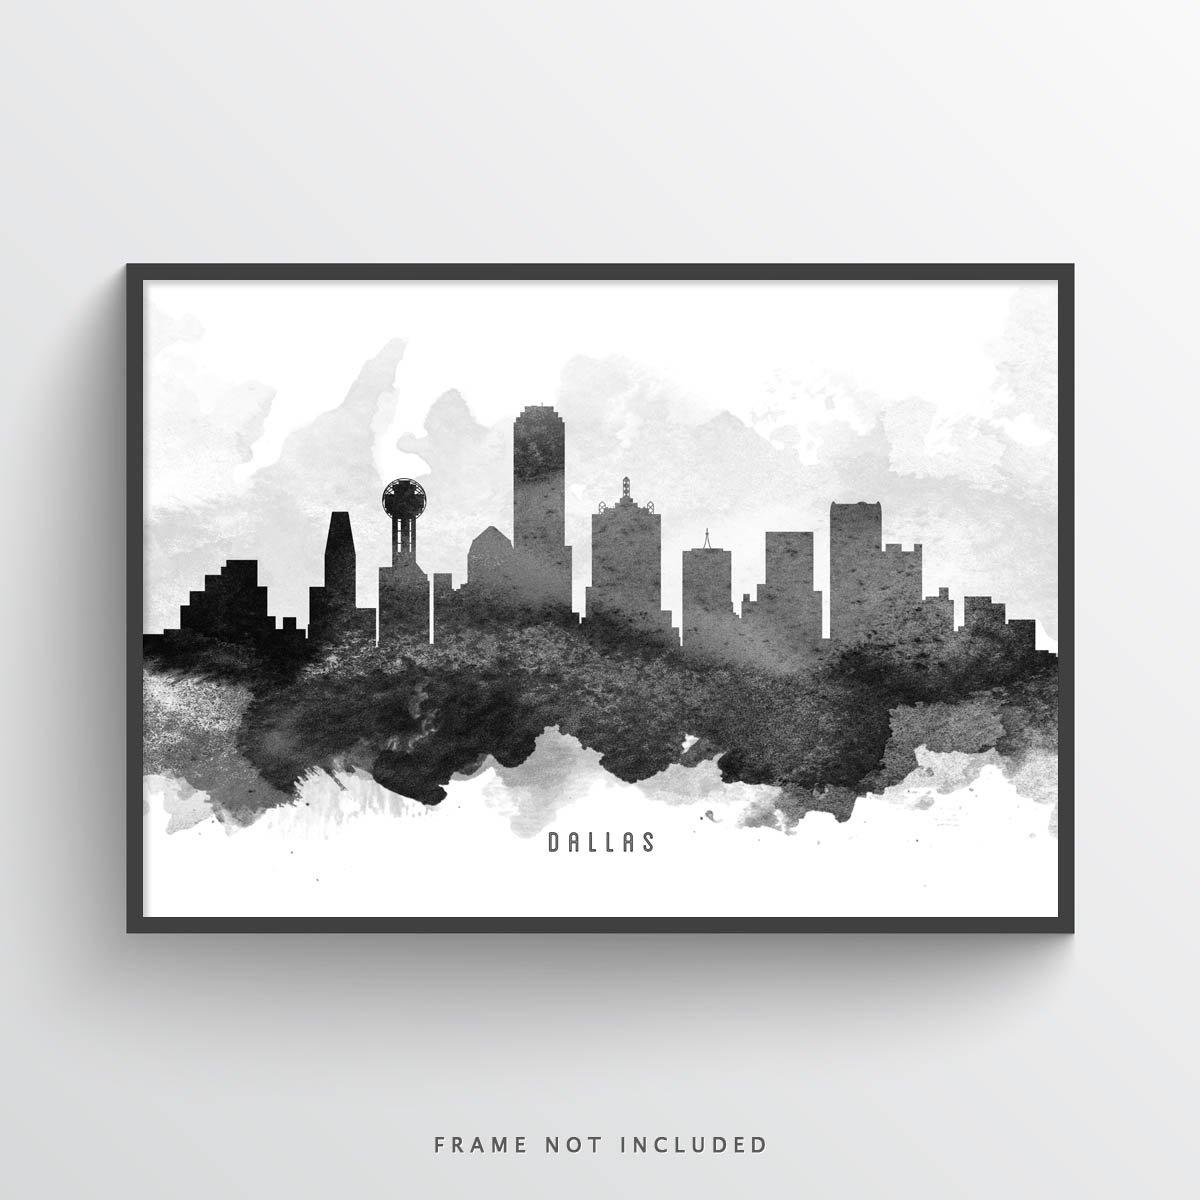 1200x1200 Dallas Skyline Watercolor Art Print